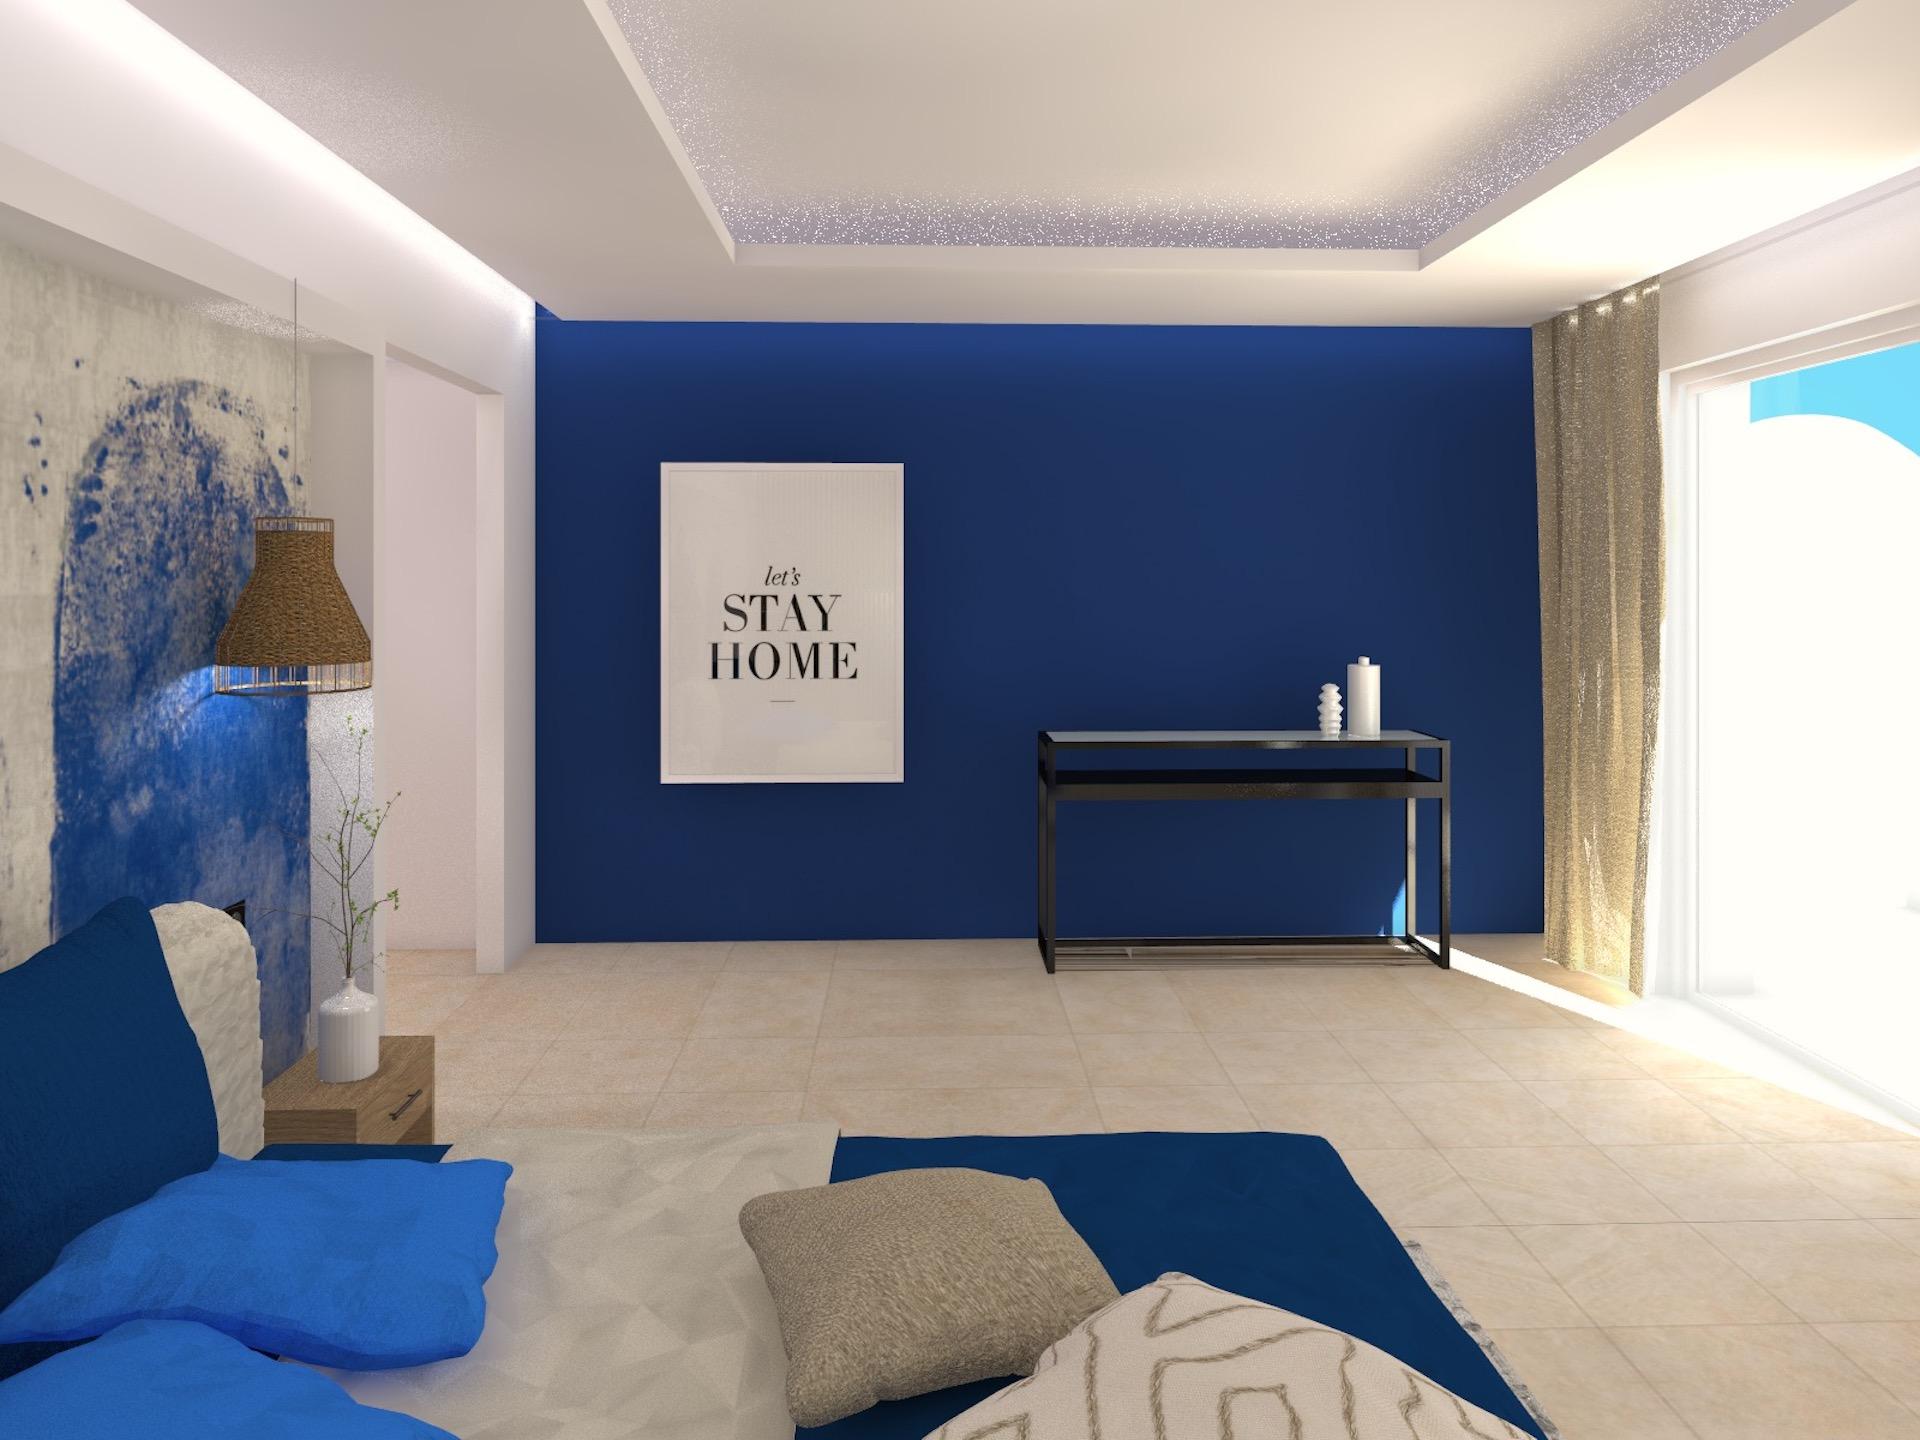 renovation villa luxe semaphore sainte-maxime var architecture interieure20